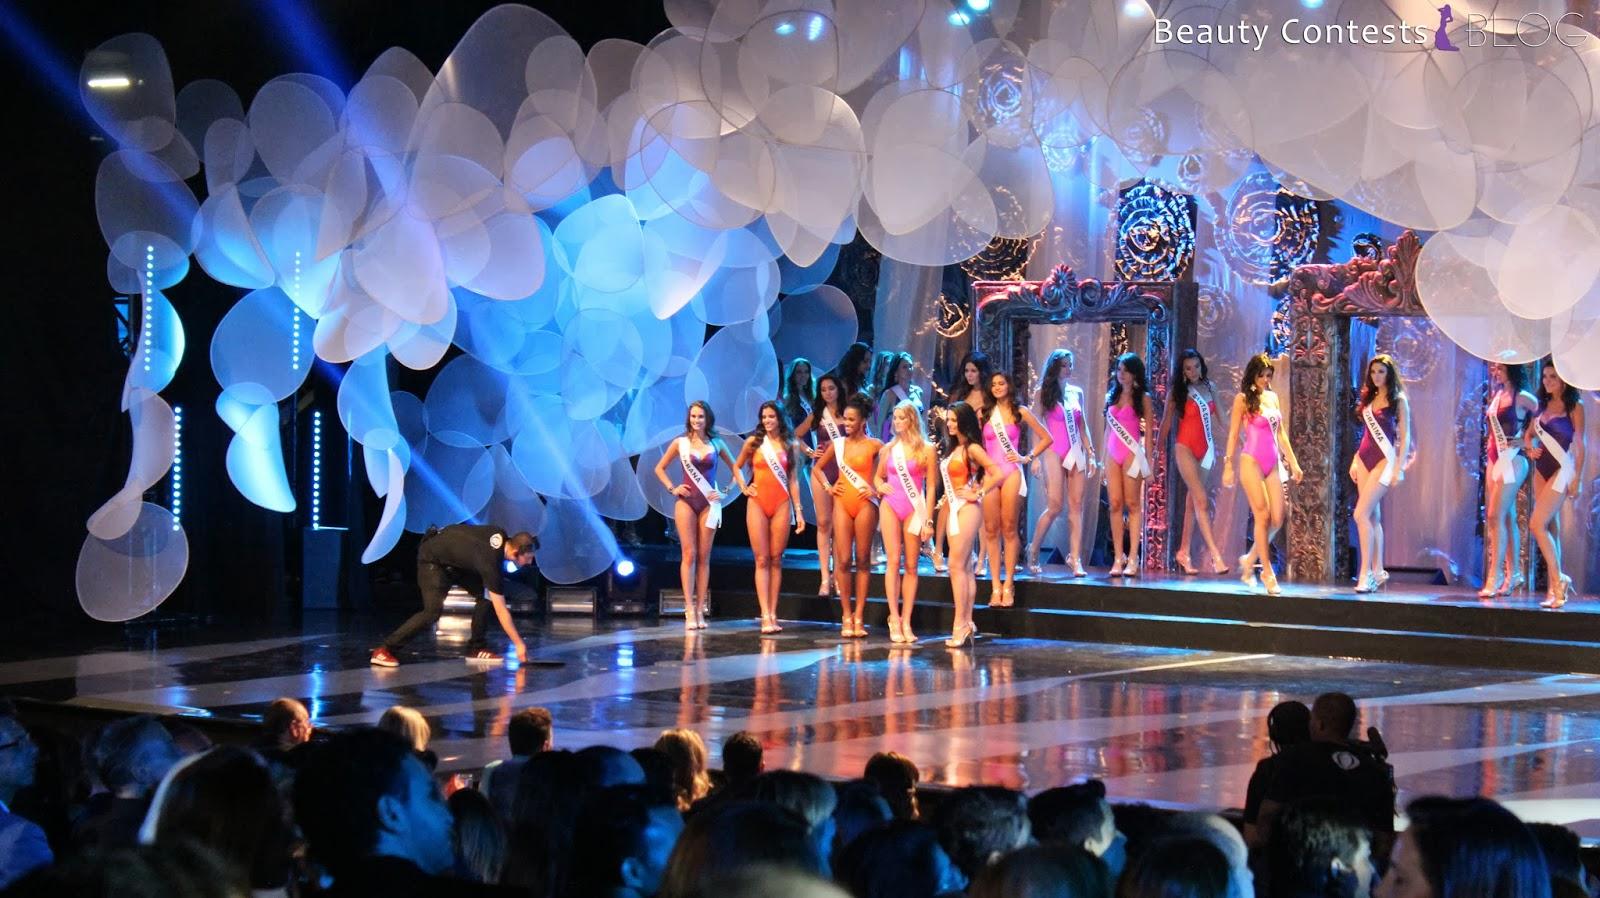 Miss Universe 2013 Normans Blog 2015 | Personal Blog